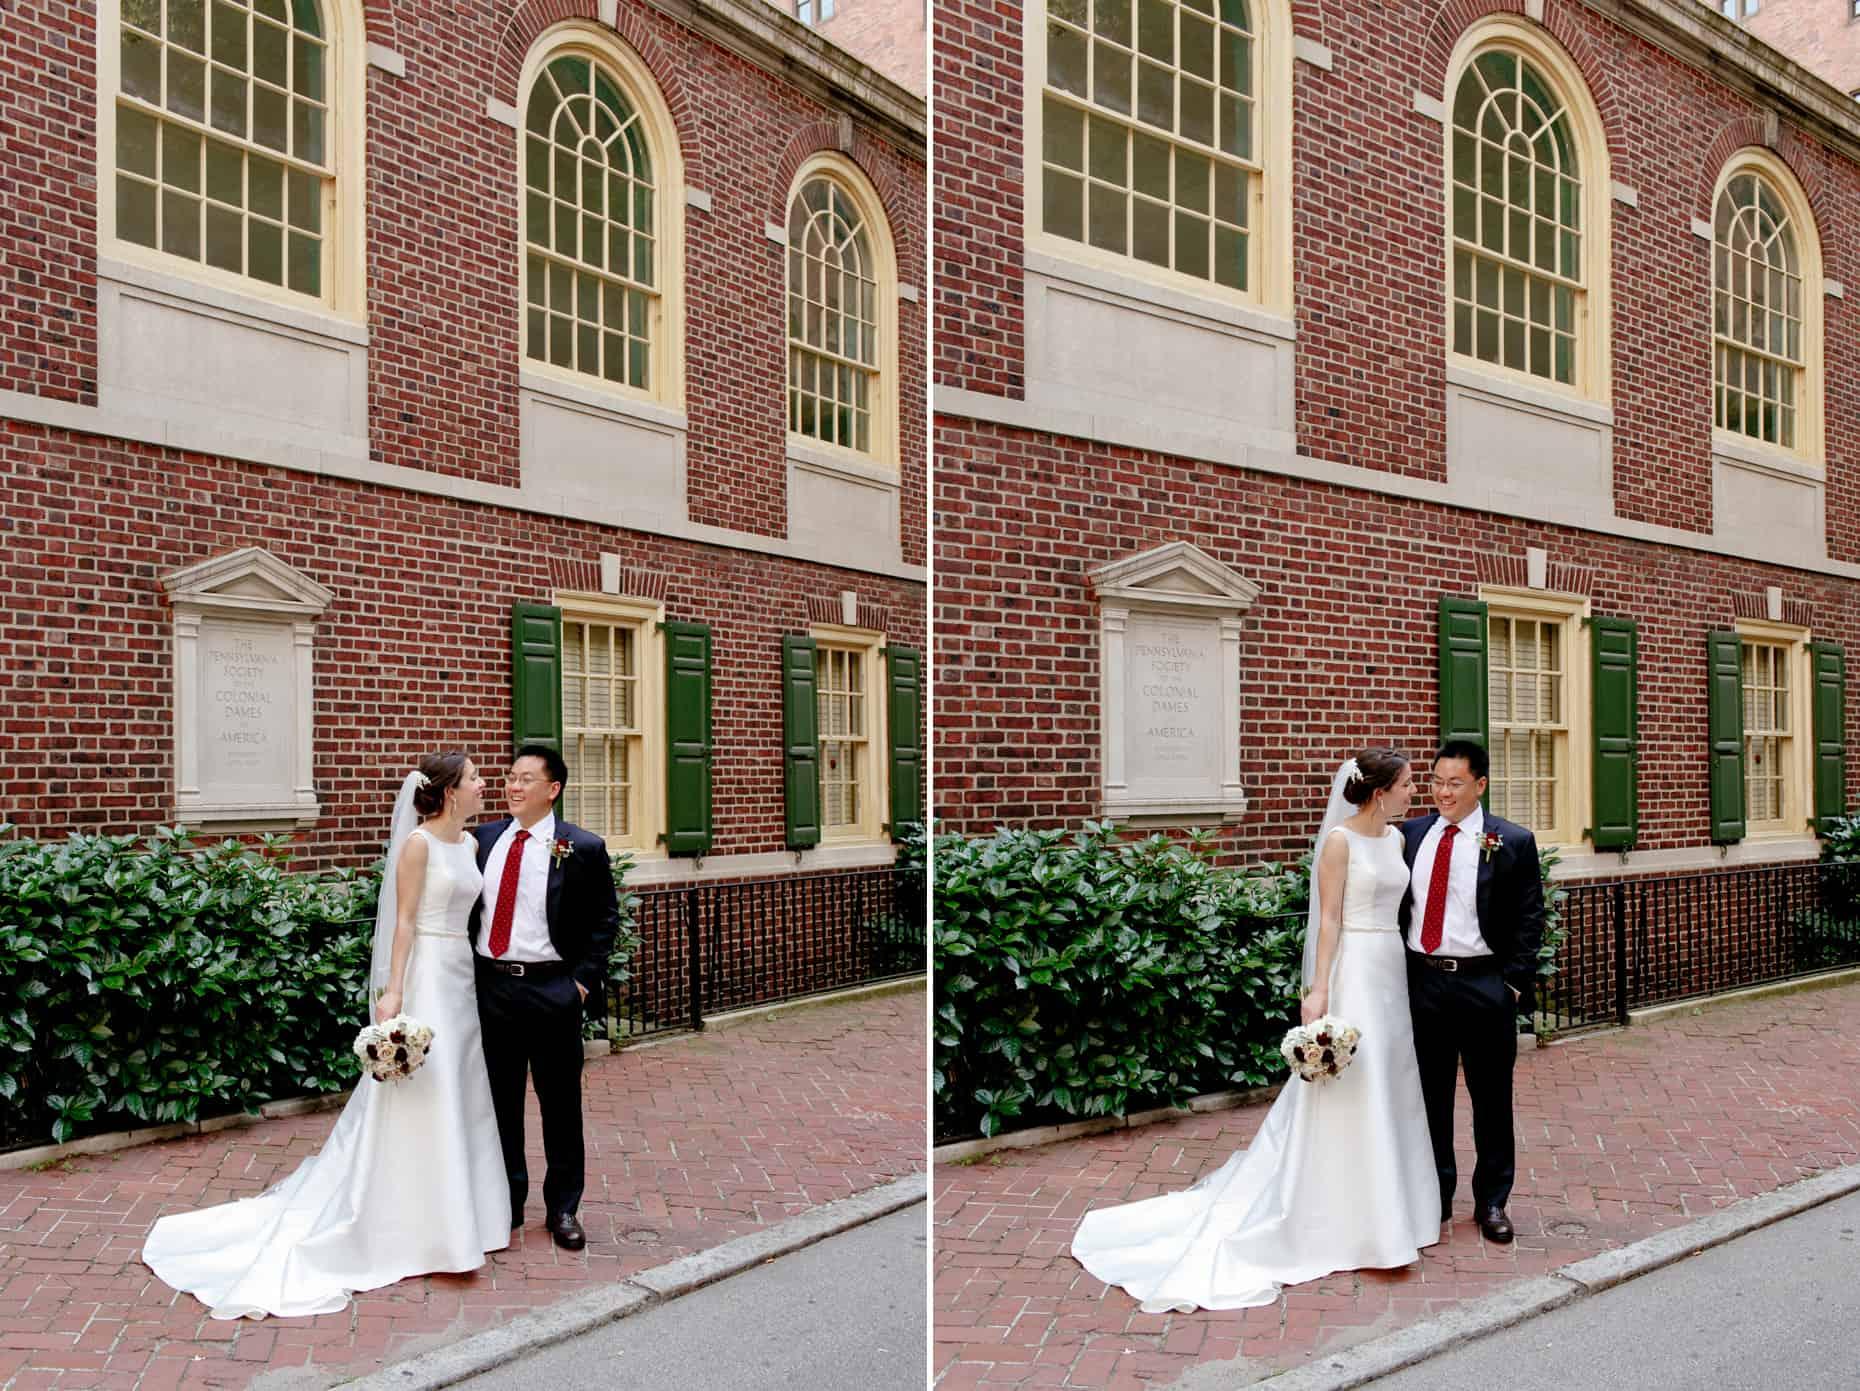 Wedding pictures Philadelphia Colonial Dames